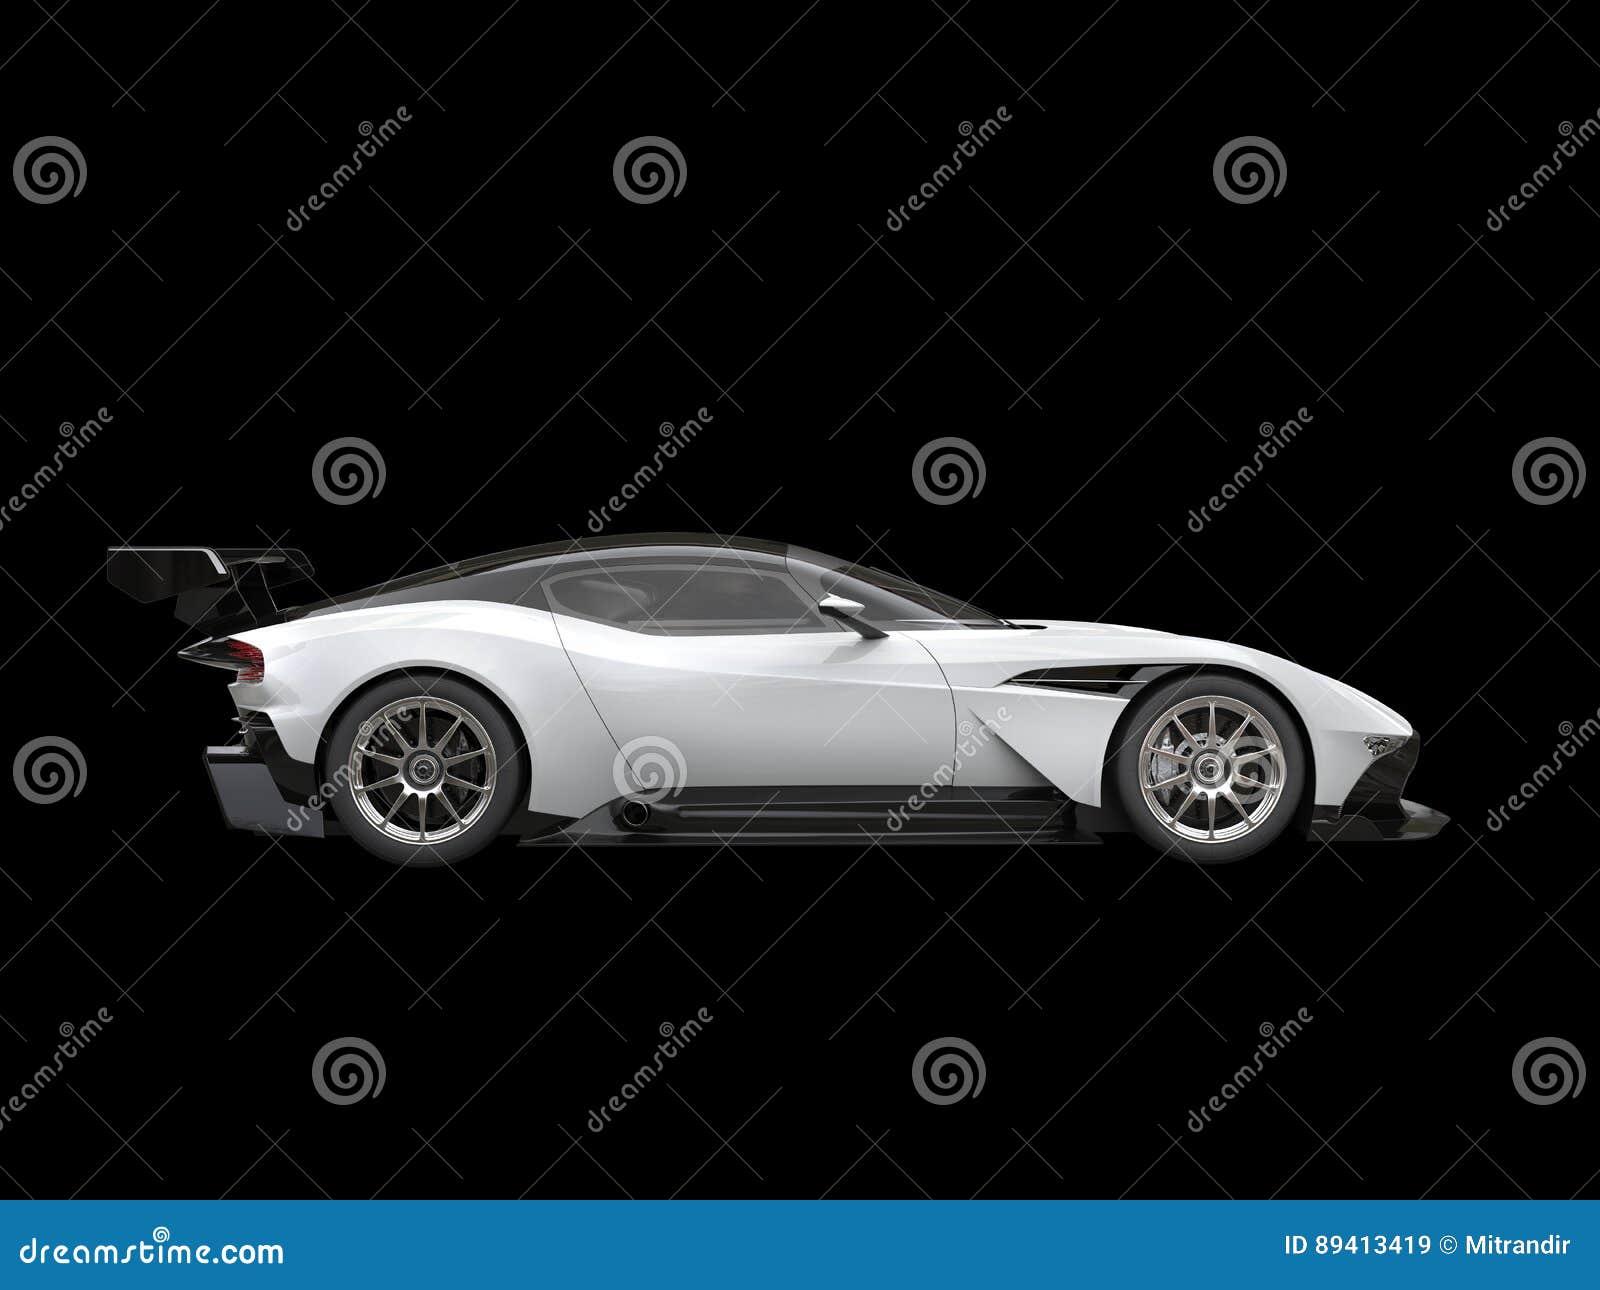 Black And White Modern Sports Super Car On Black Background Stock